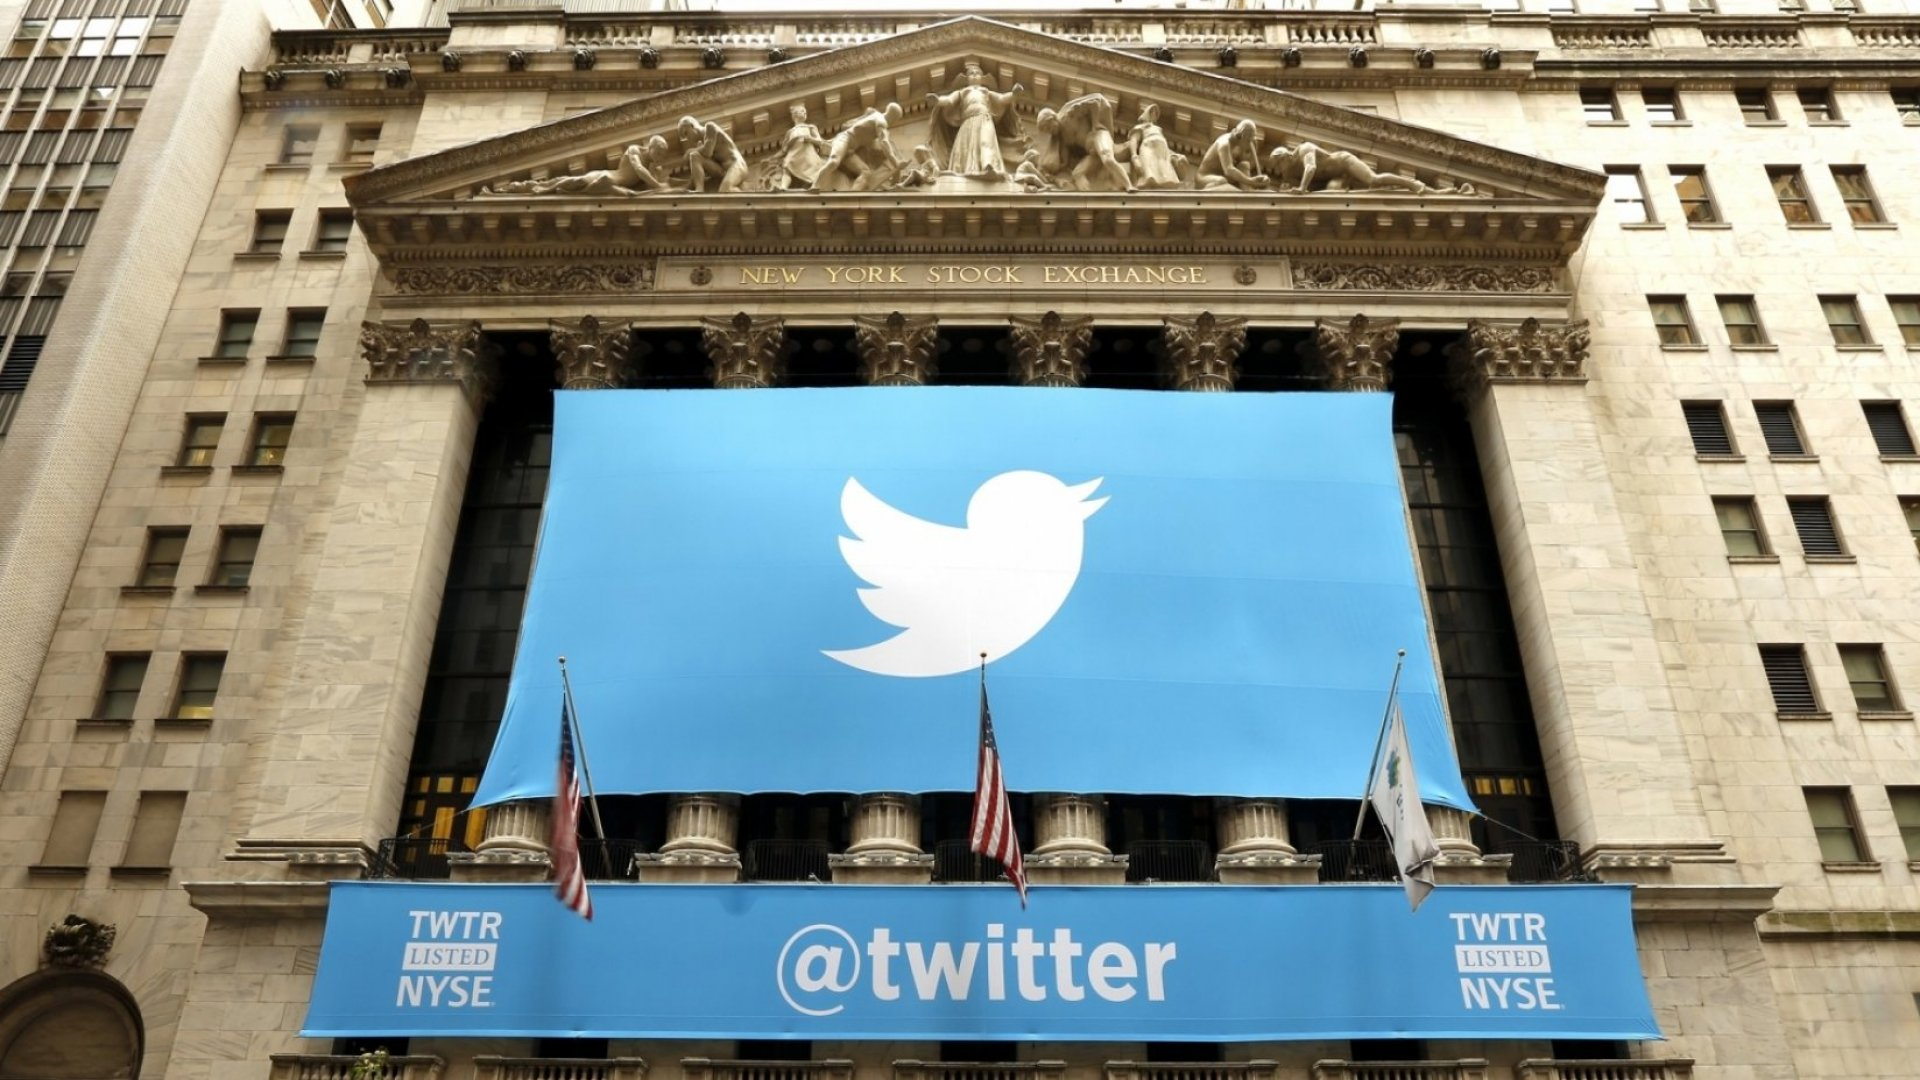 Twitter Shares Soar 11 Percent Despite Its First Revenue Drop Since IPO